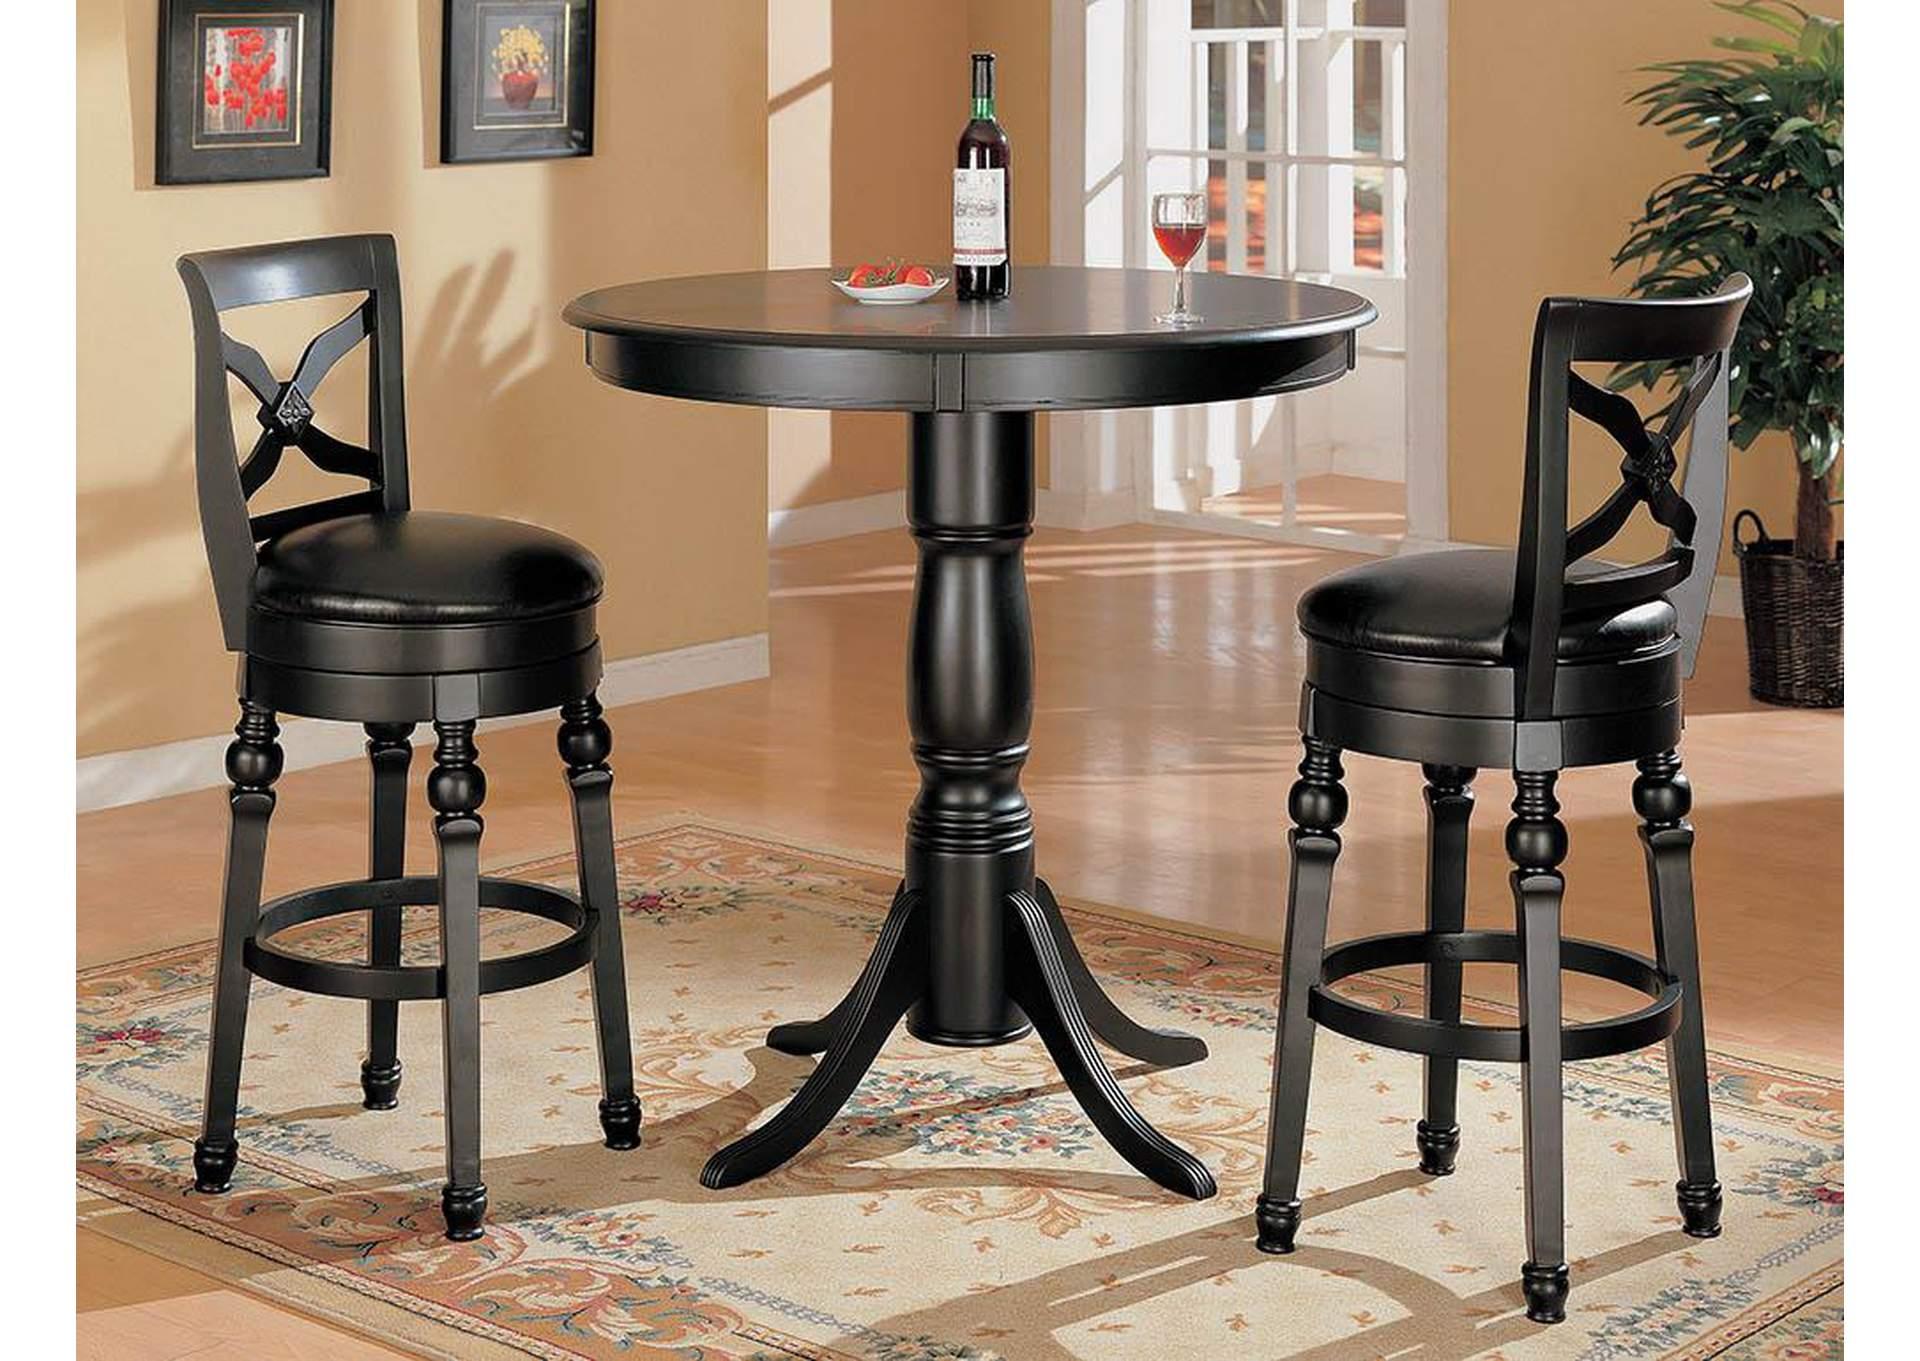 dream decor furniture springfield ma bar stool